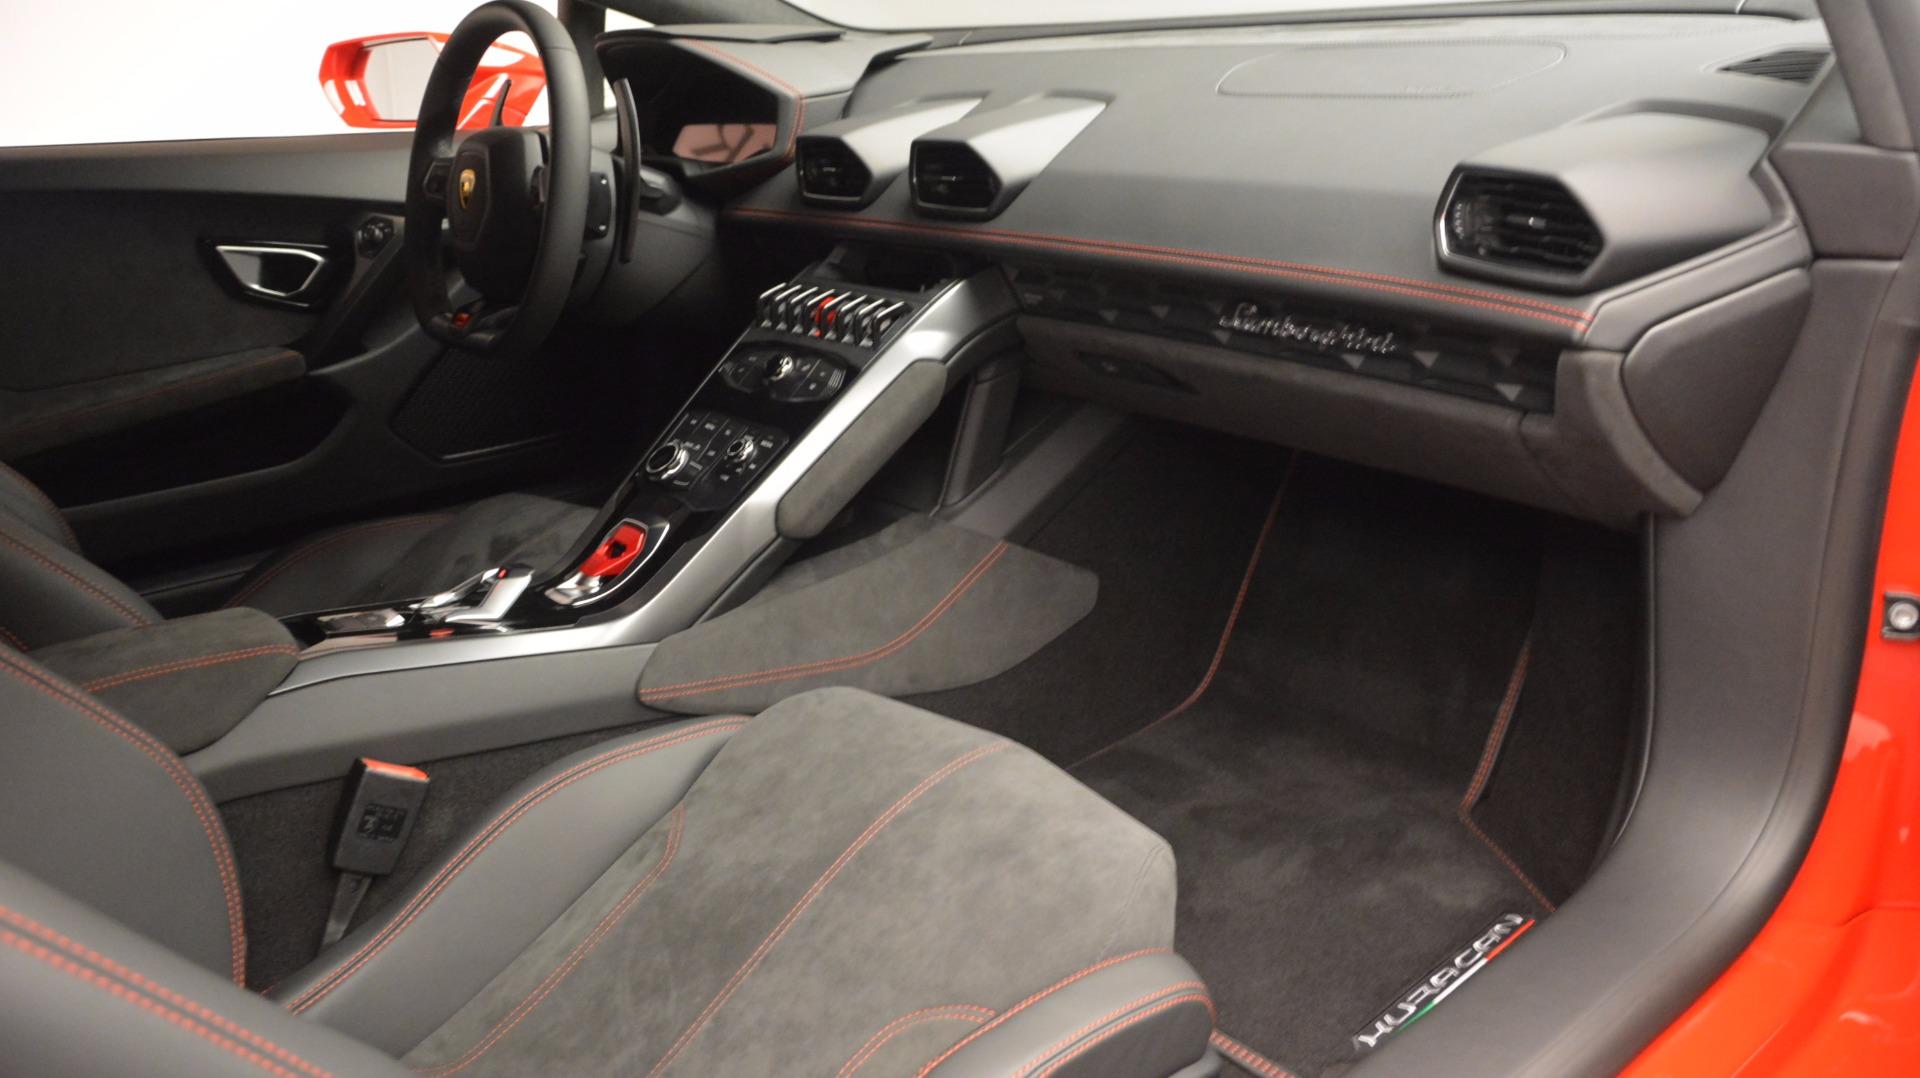 Used 2016 Lamborghini Huracan LP 580-2 For Sale In Greenwich, CT. Alfa Romeo of Greenwich, 7184 1070_p33